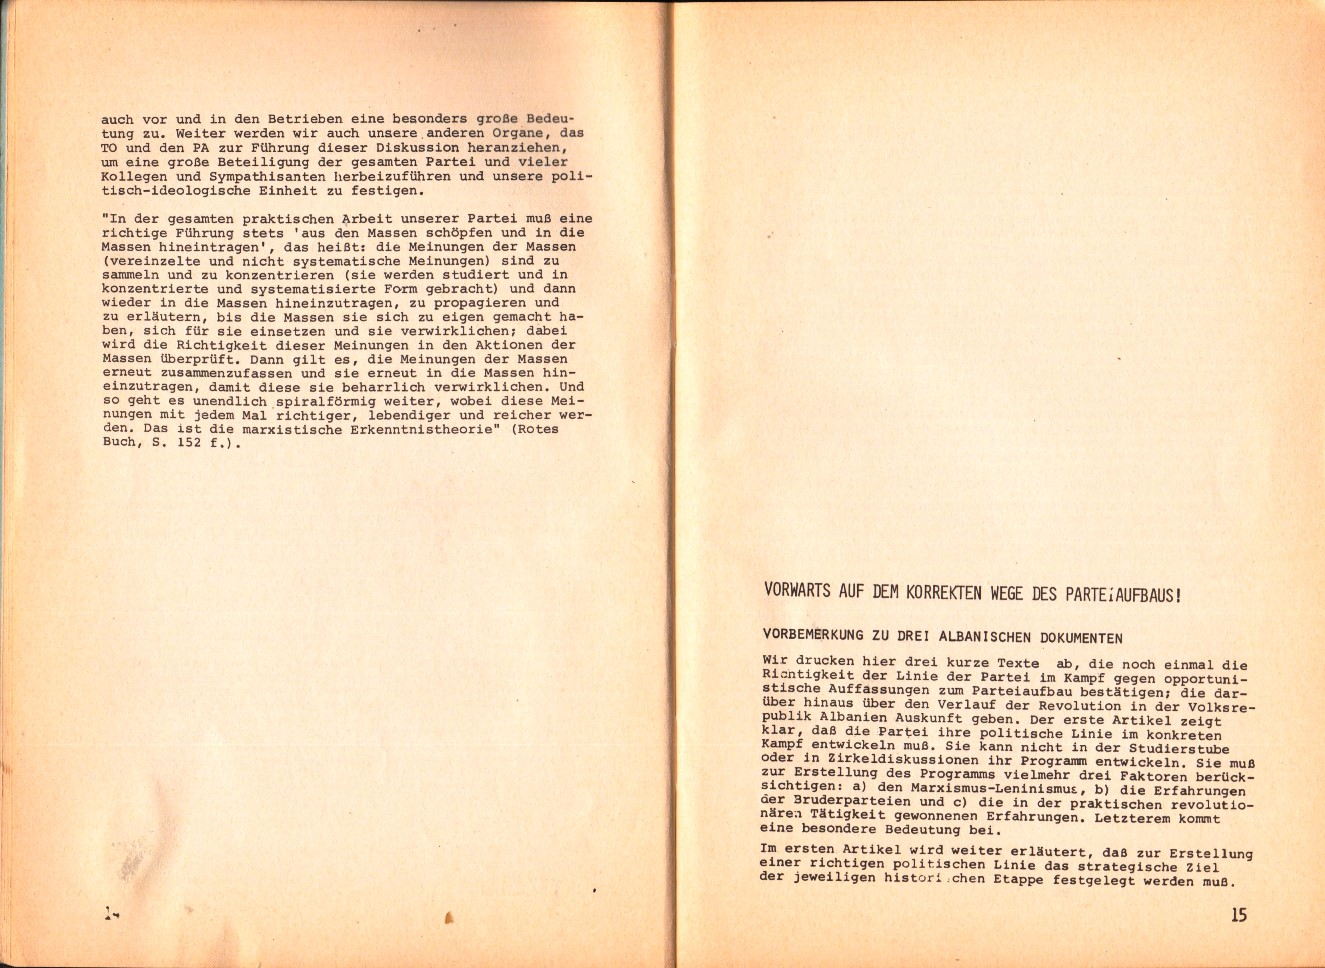 ZB_Parteiarbeiter_1971_10_09